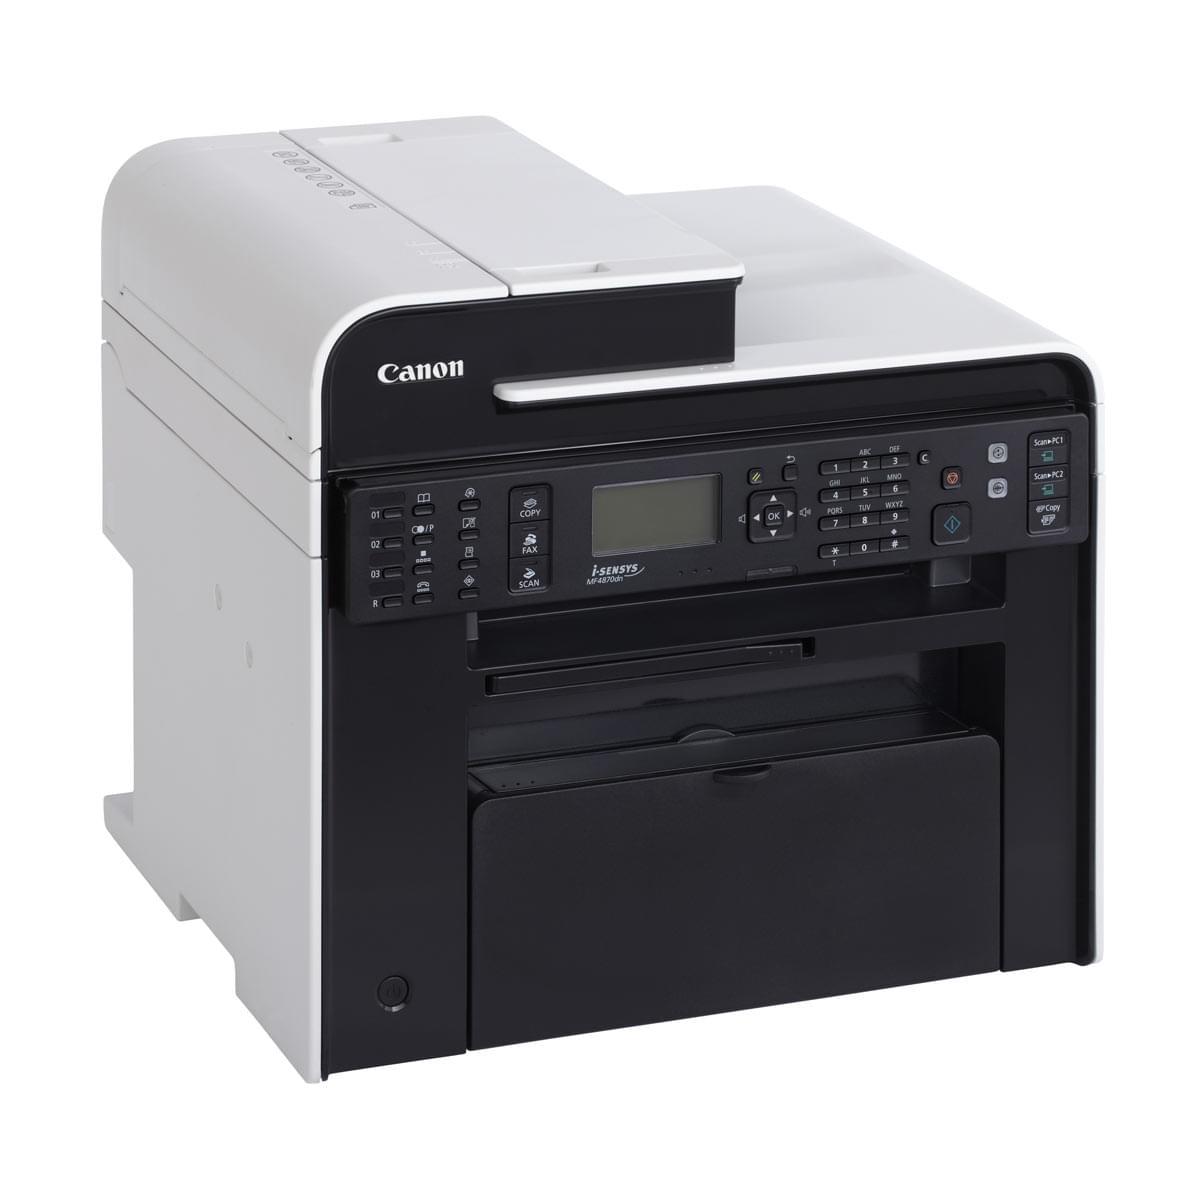 Imprimante multifonction Canon i-SENSYS MF4870DN - Cybertek.fr - 0